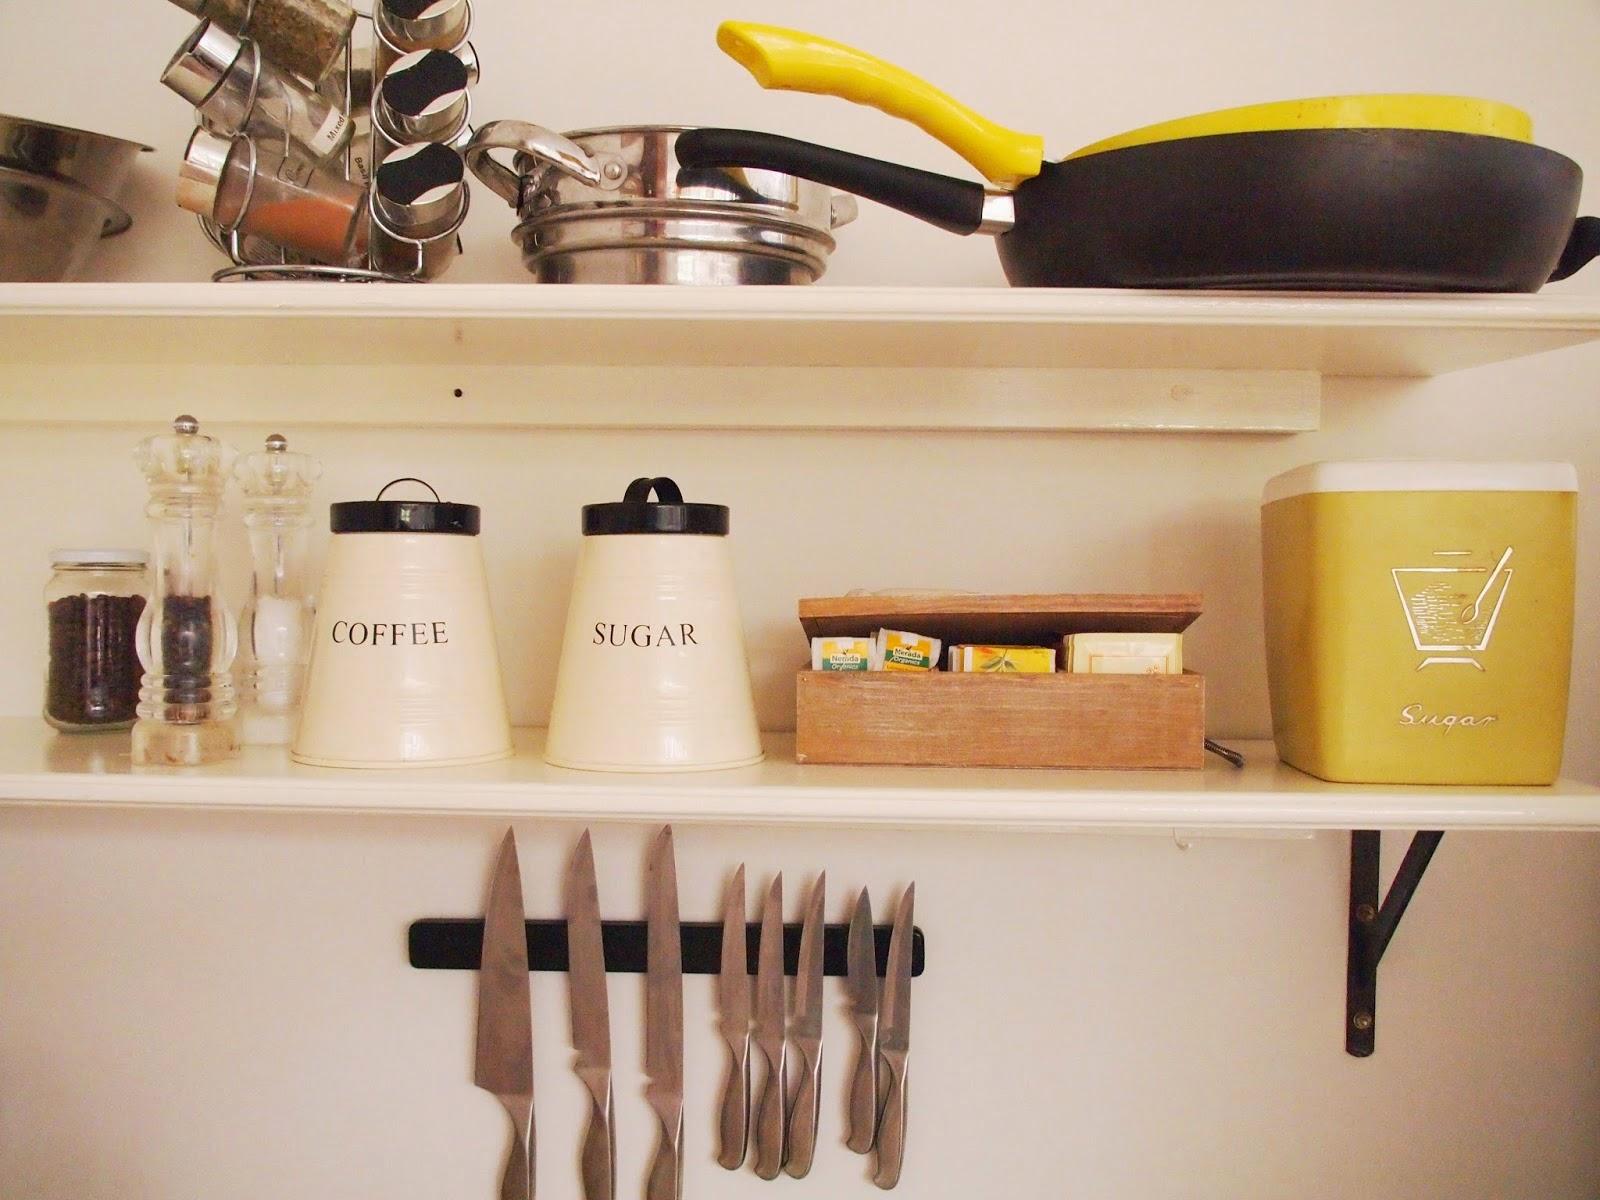 http://www.herthriftychallenge.blogspot.com.au/2014/04/white-kitchen-shelves.html